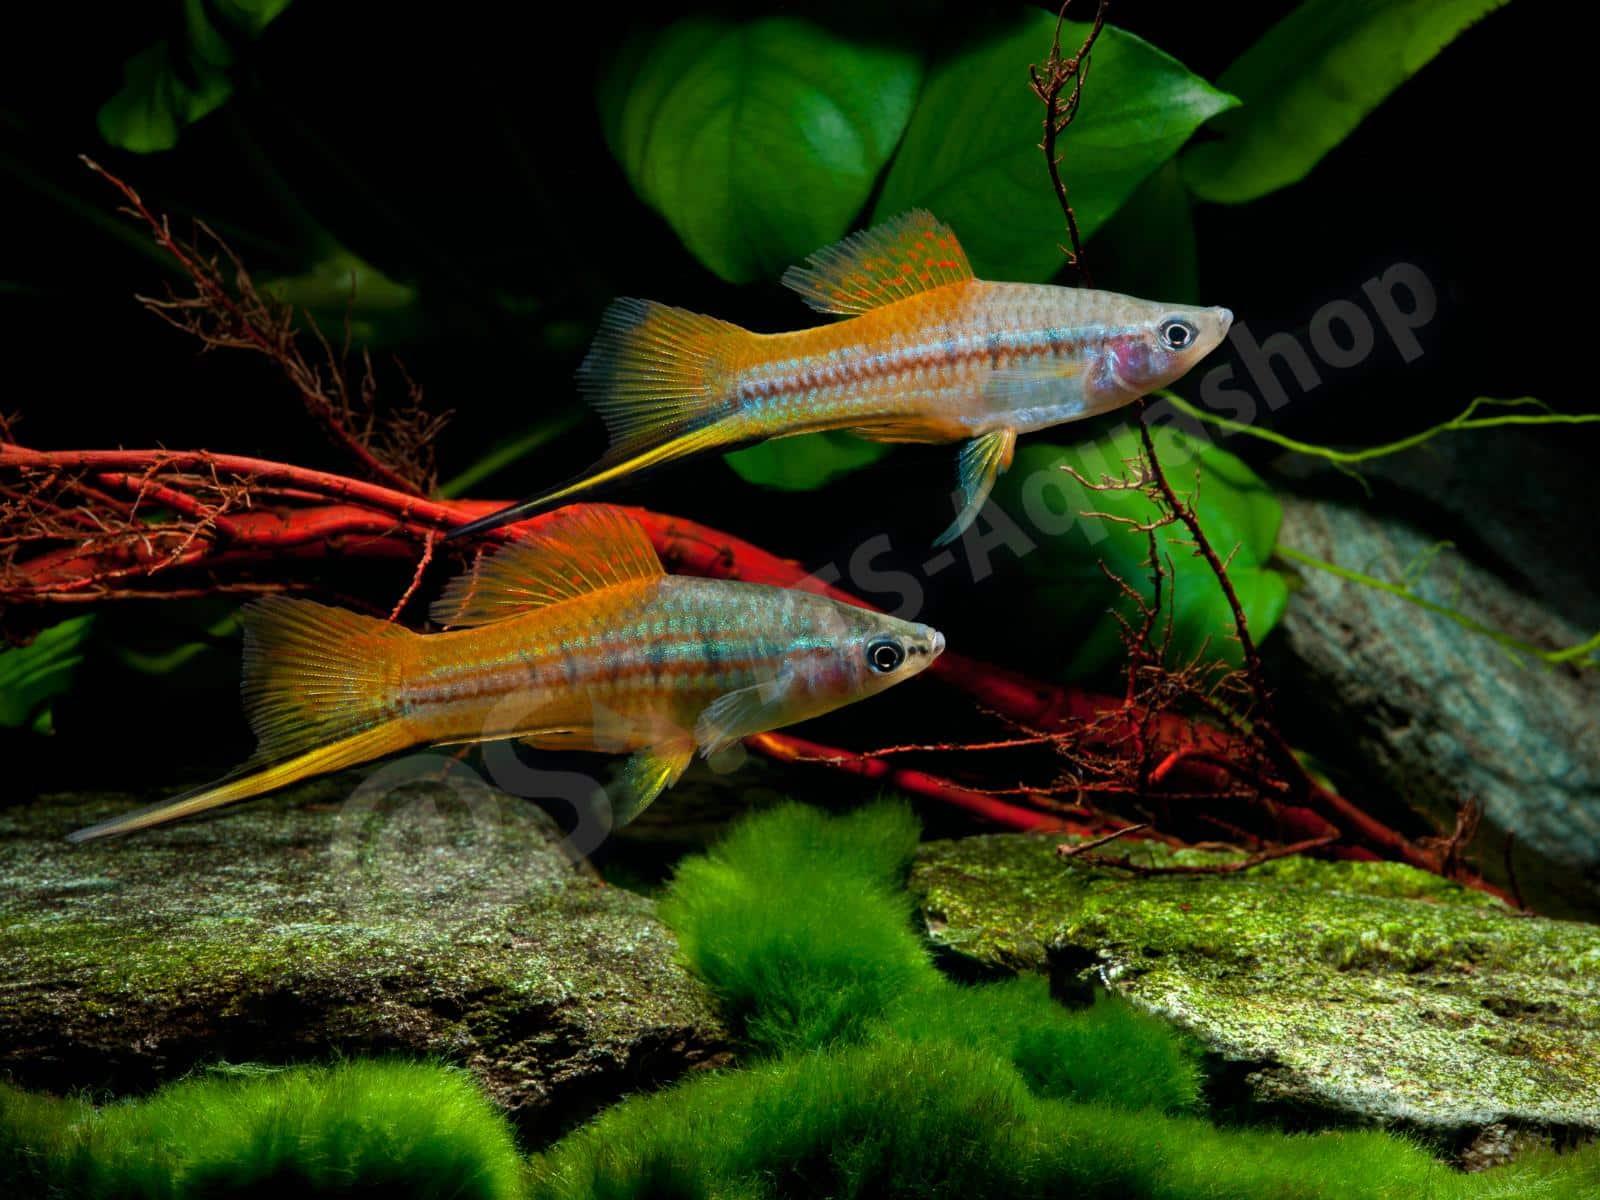 xiphophorus hellerii enrico richter 0299 6